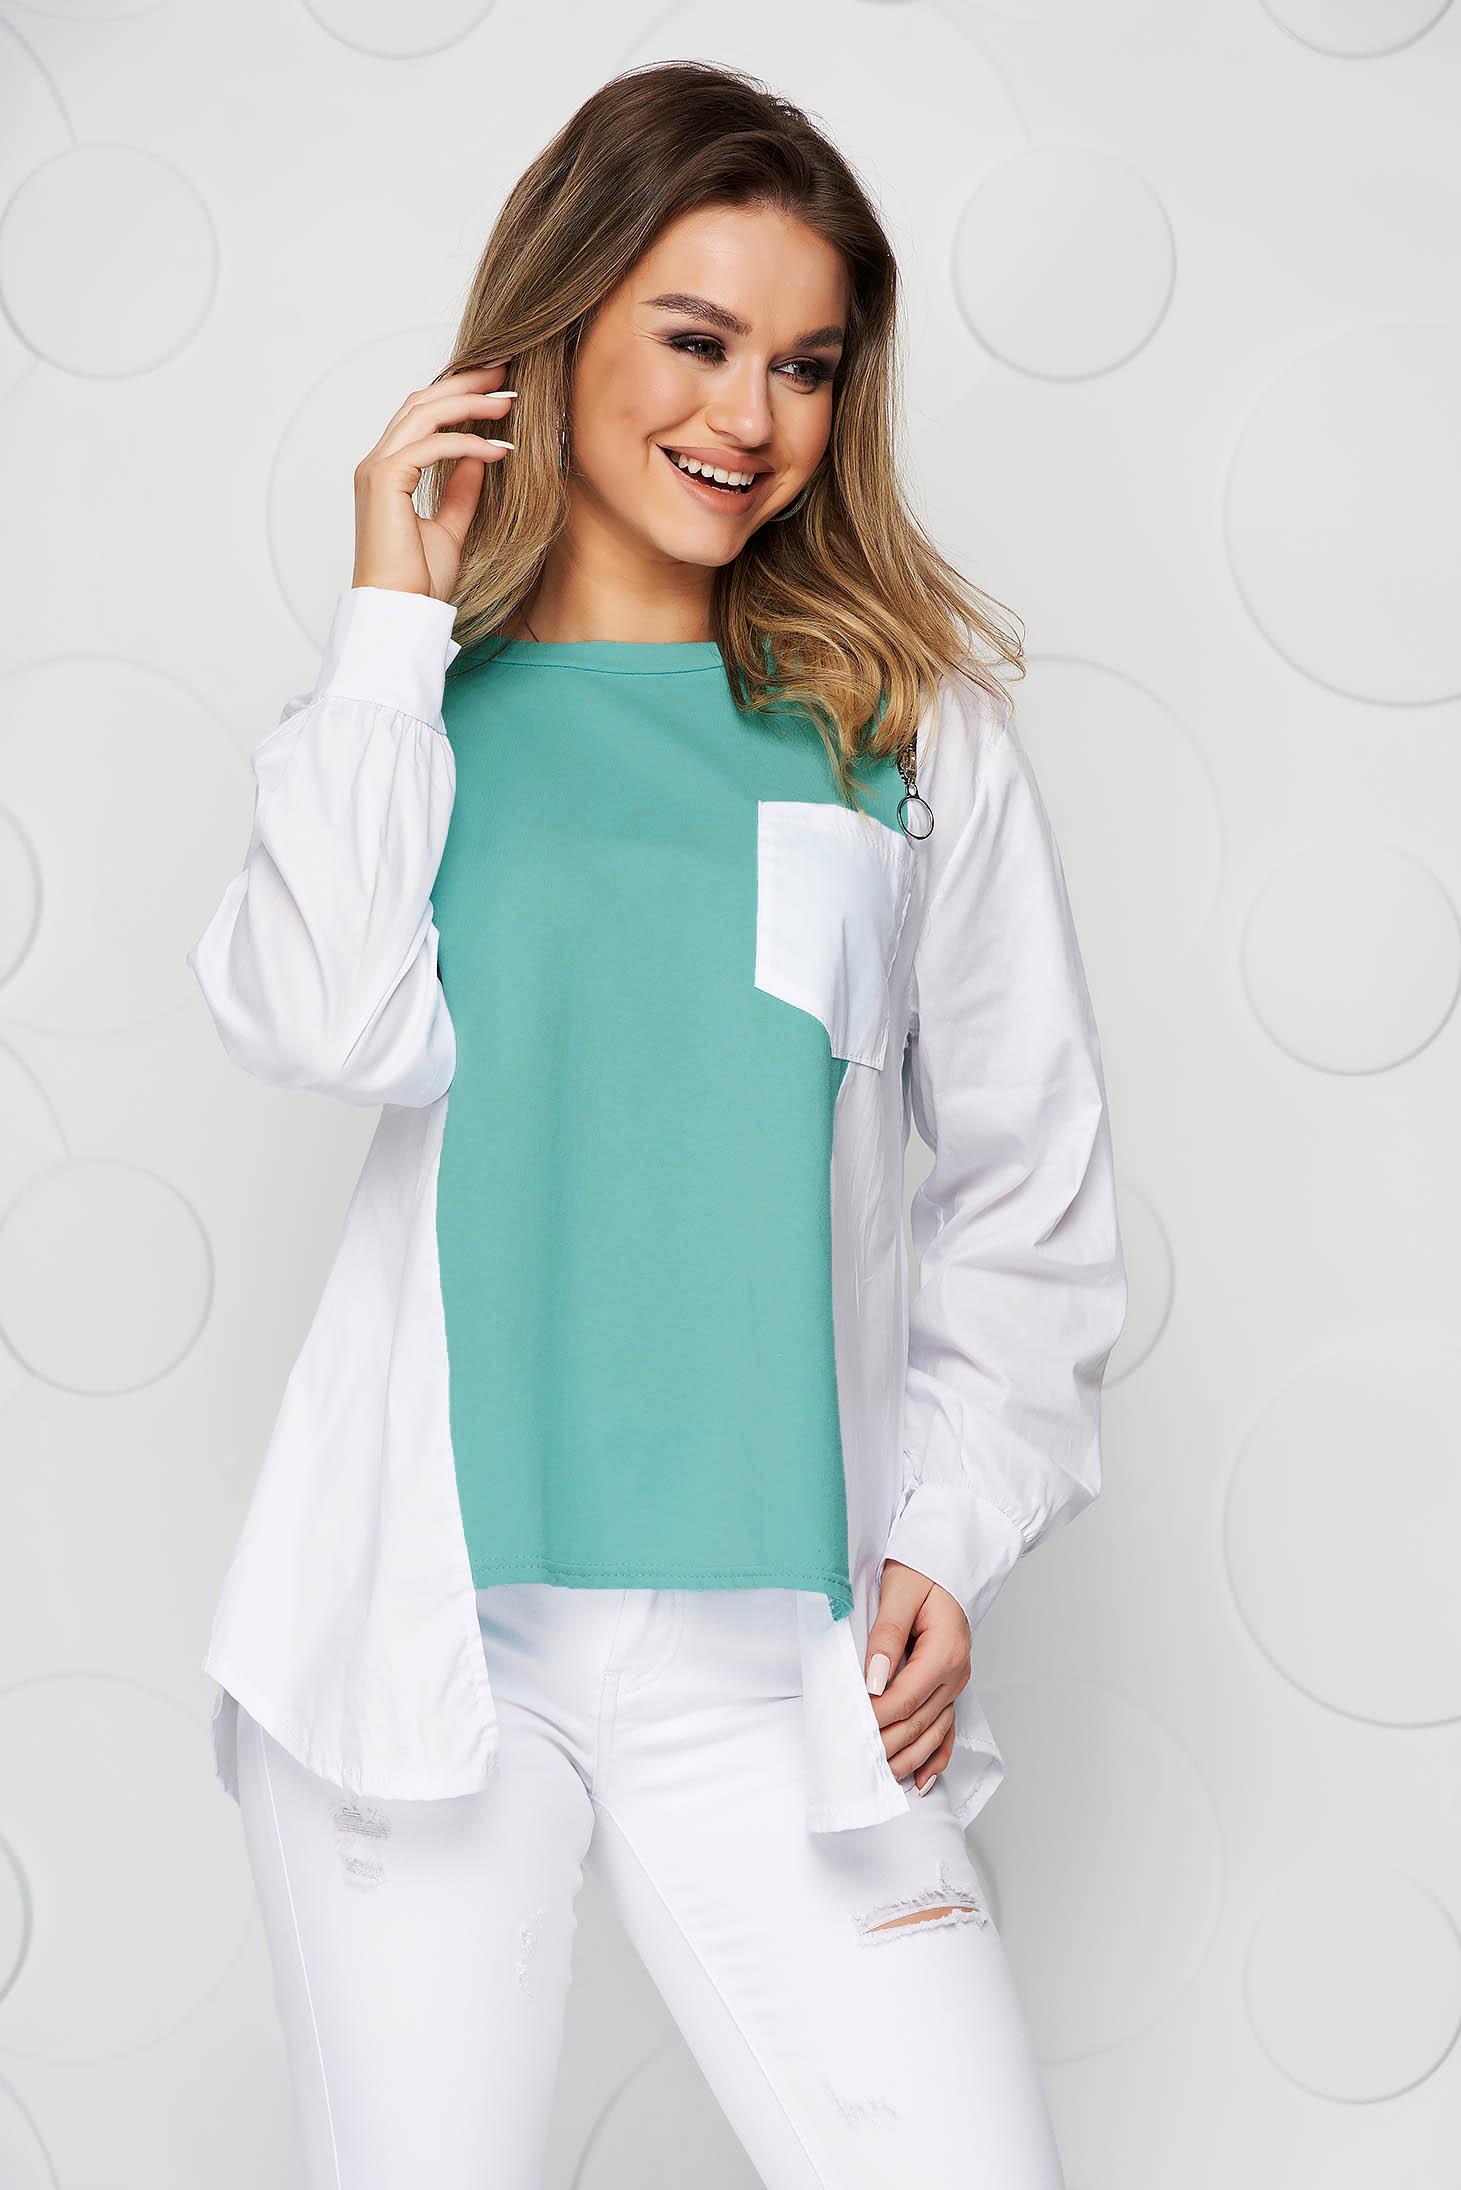 Bluza dama SunShine verde din bumbac asimetrica cu croi larg accesorizata cu fermoare